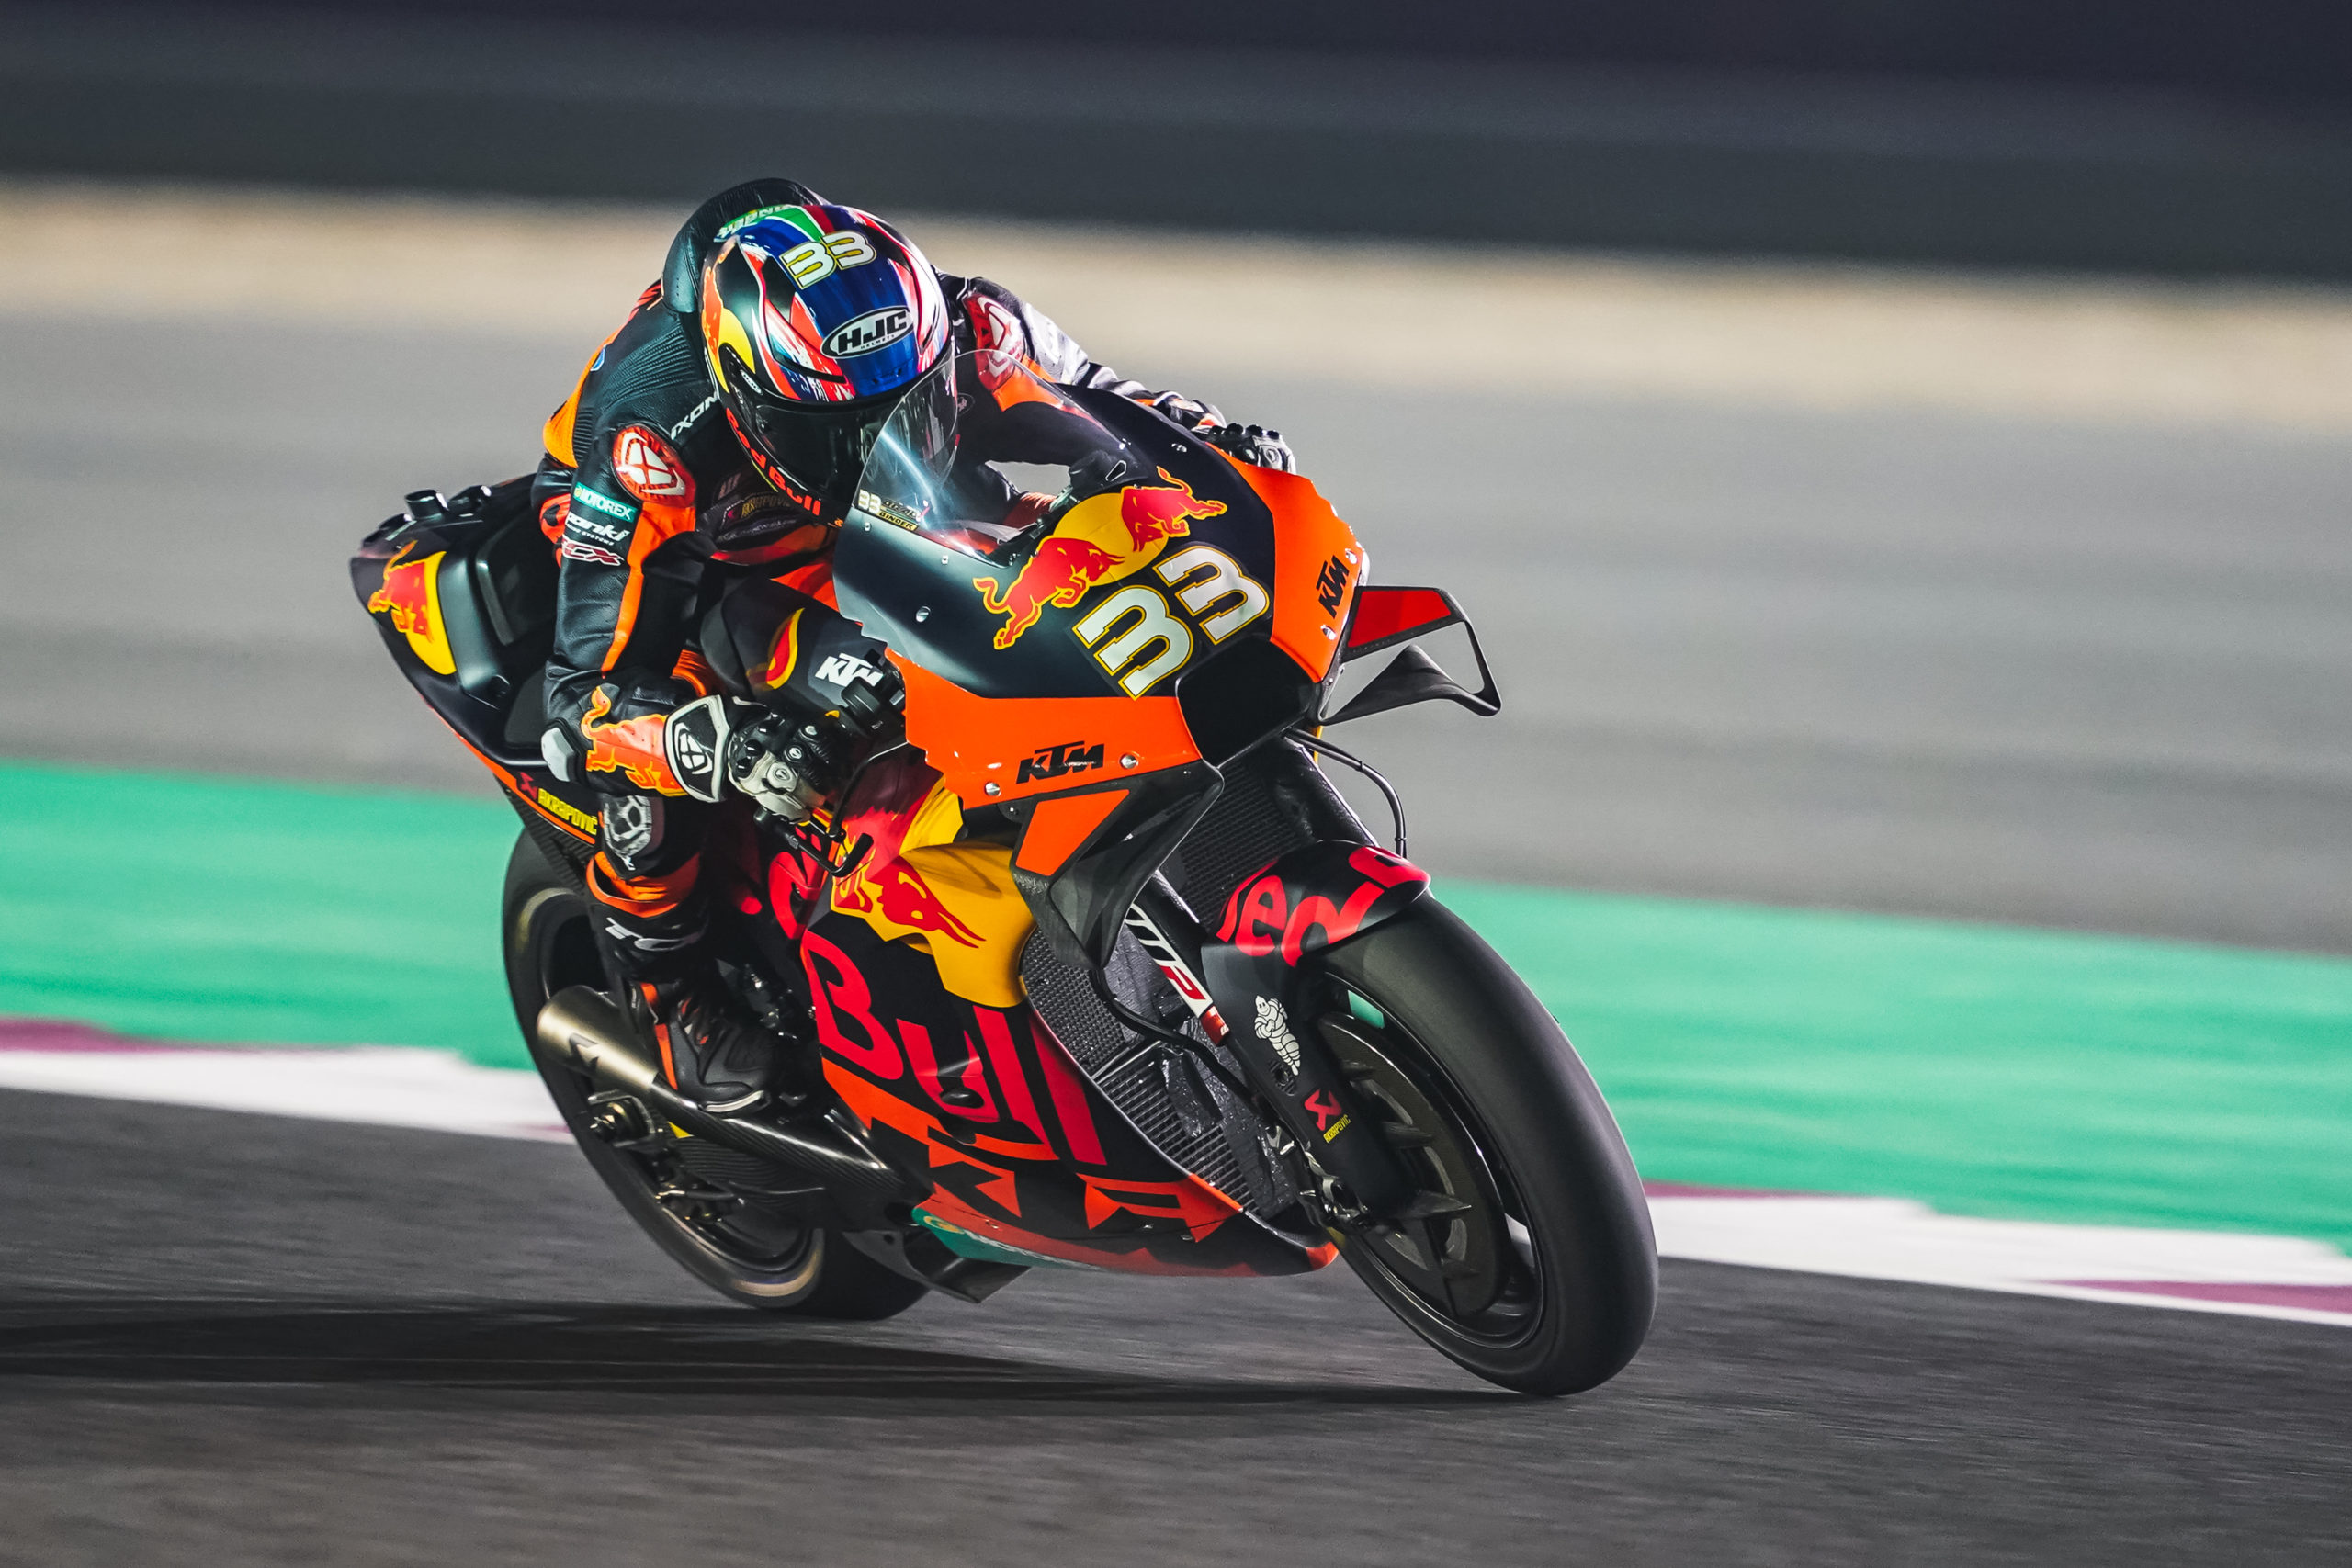 Brad Binder, Qatar Test, MotoGP 2020 - Losail International Circuit (QAT)